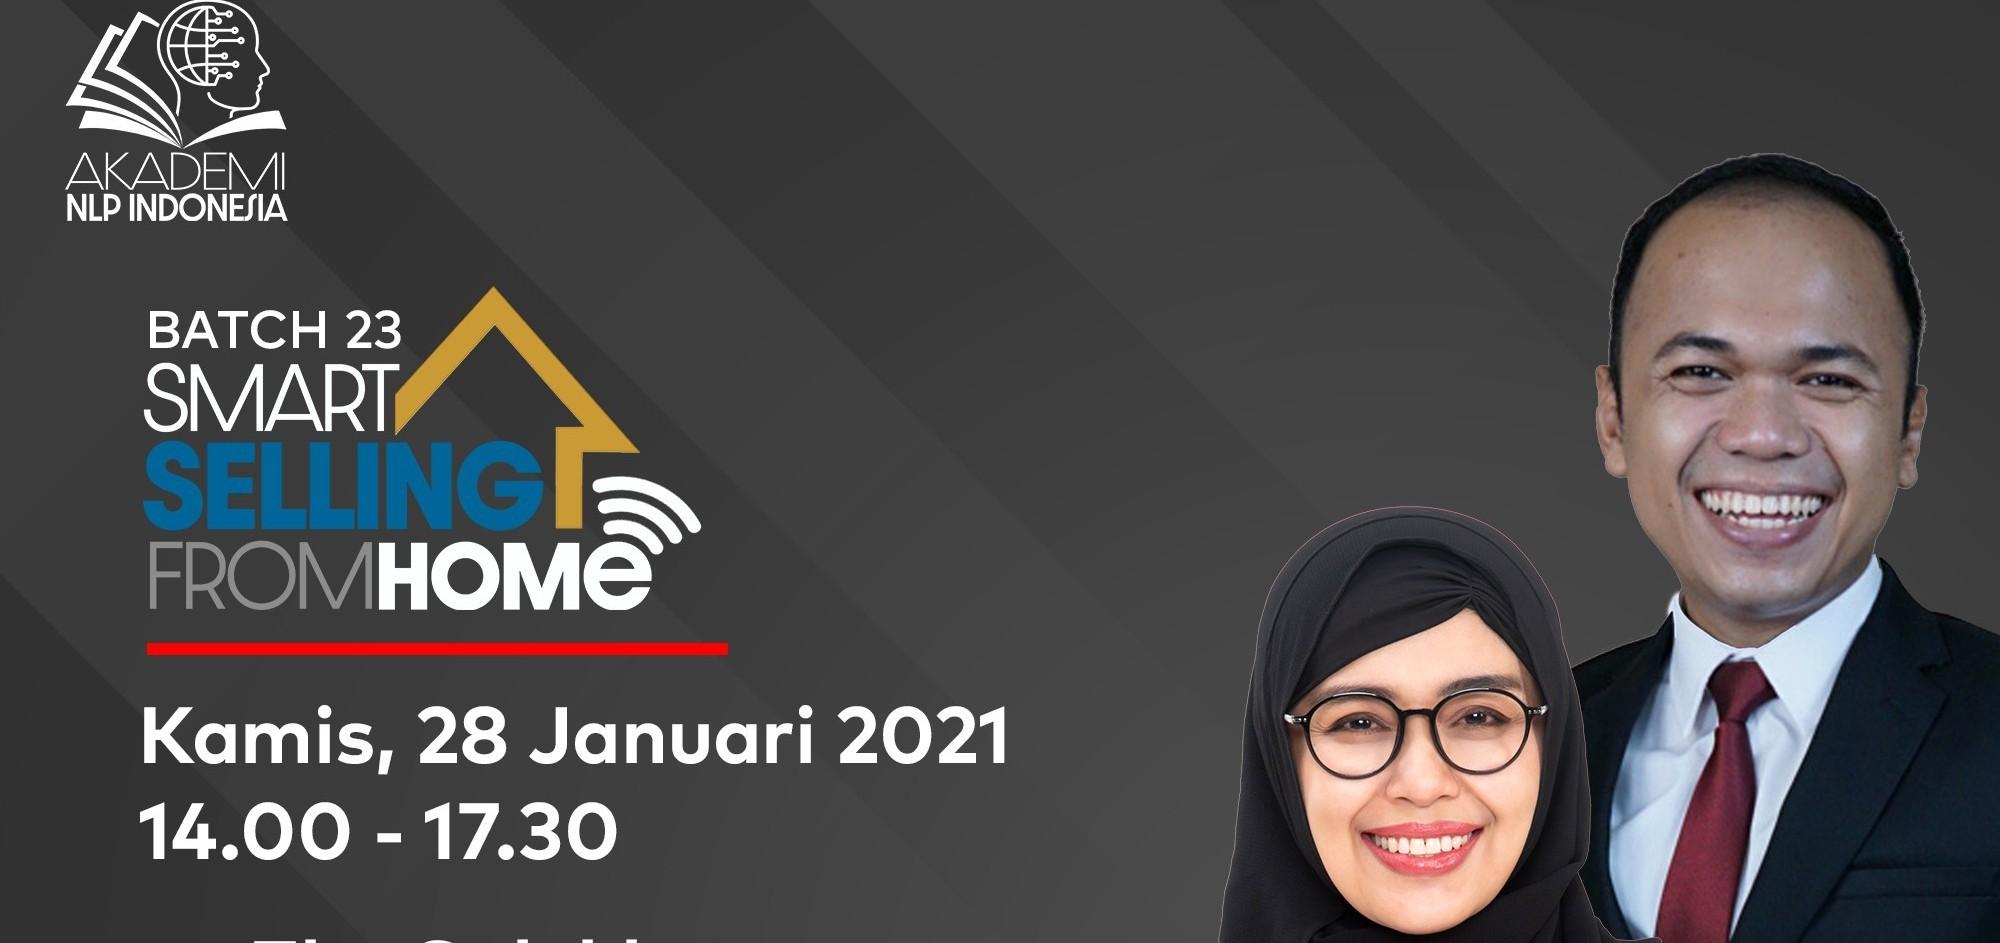 Smart Selling From Home With Eka Solekhatun & Firdaus Adenan Batch 23